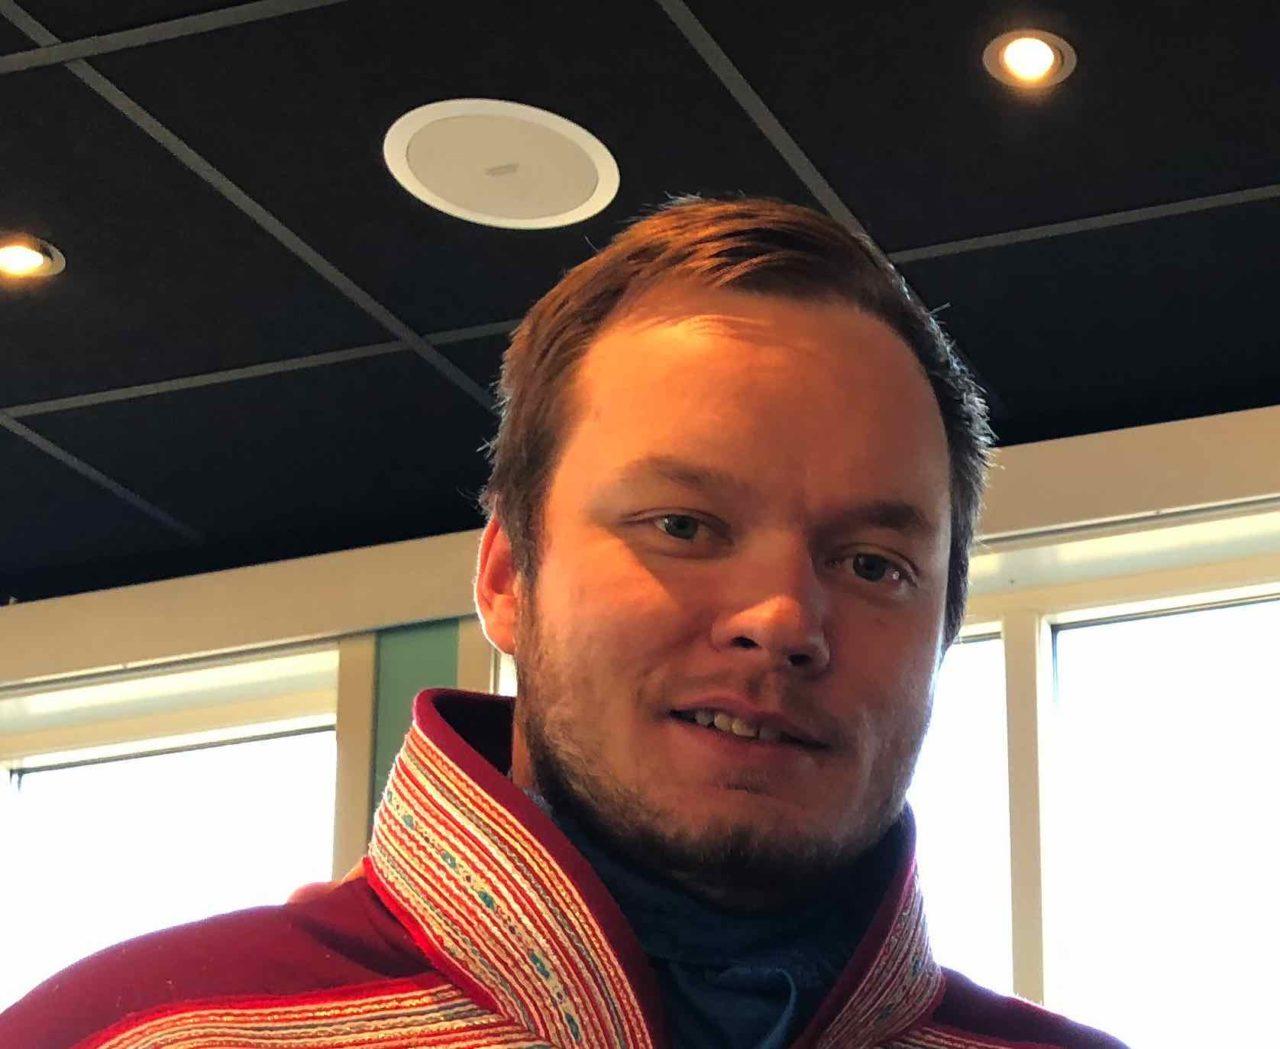 Johan-vasara-kofte-1280x1049.jpg